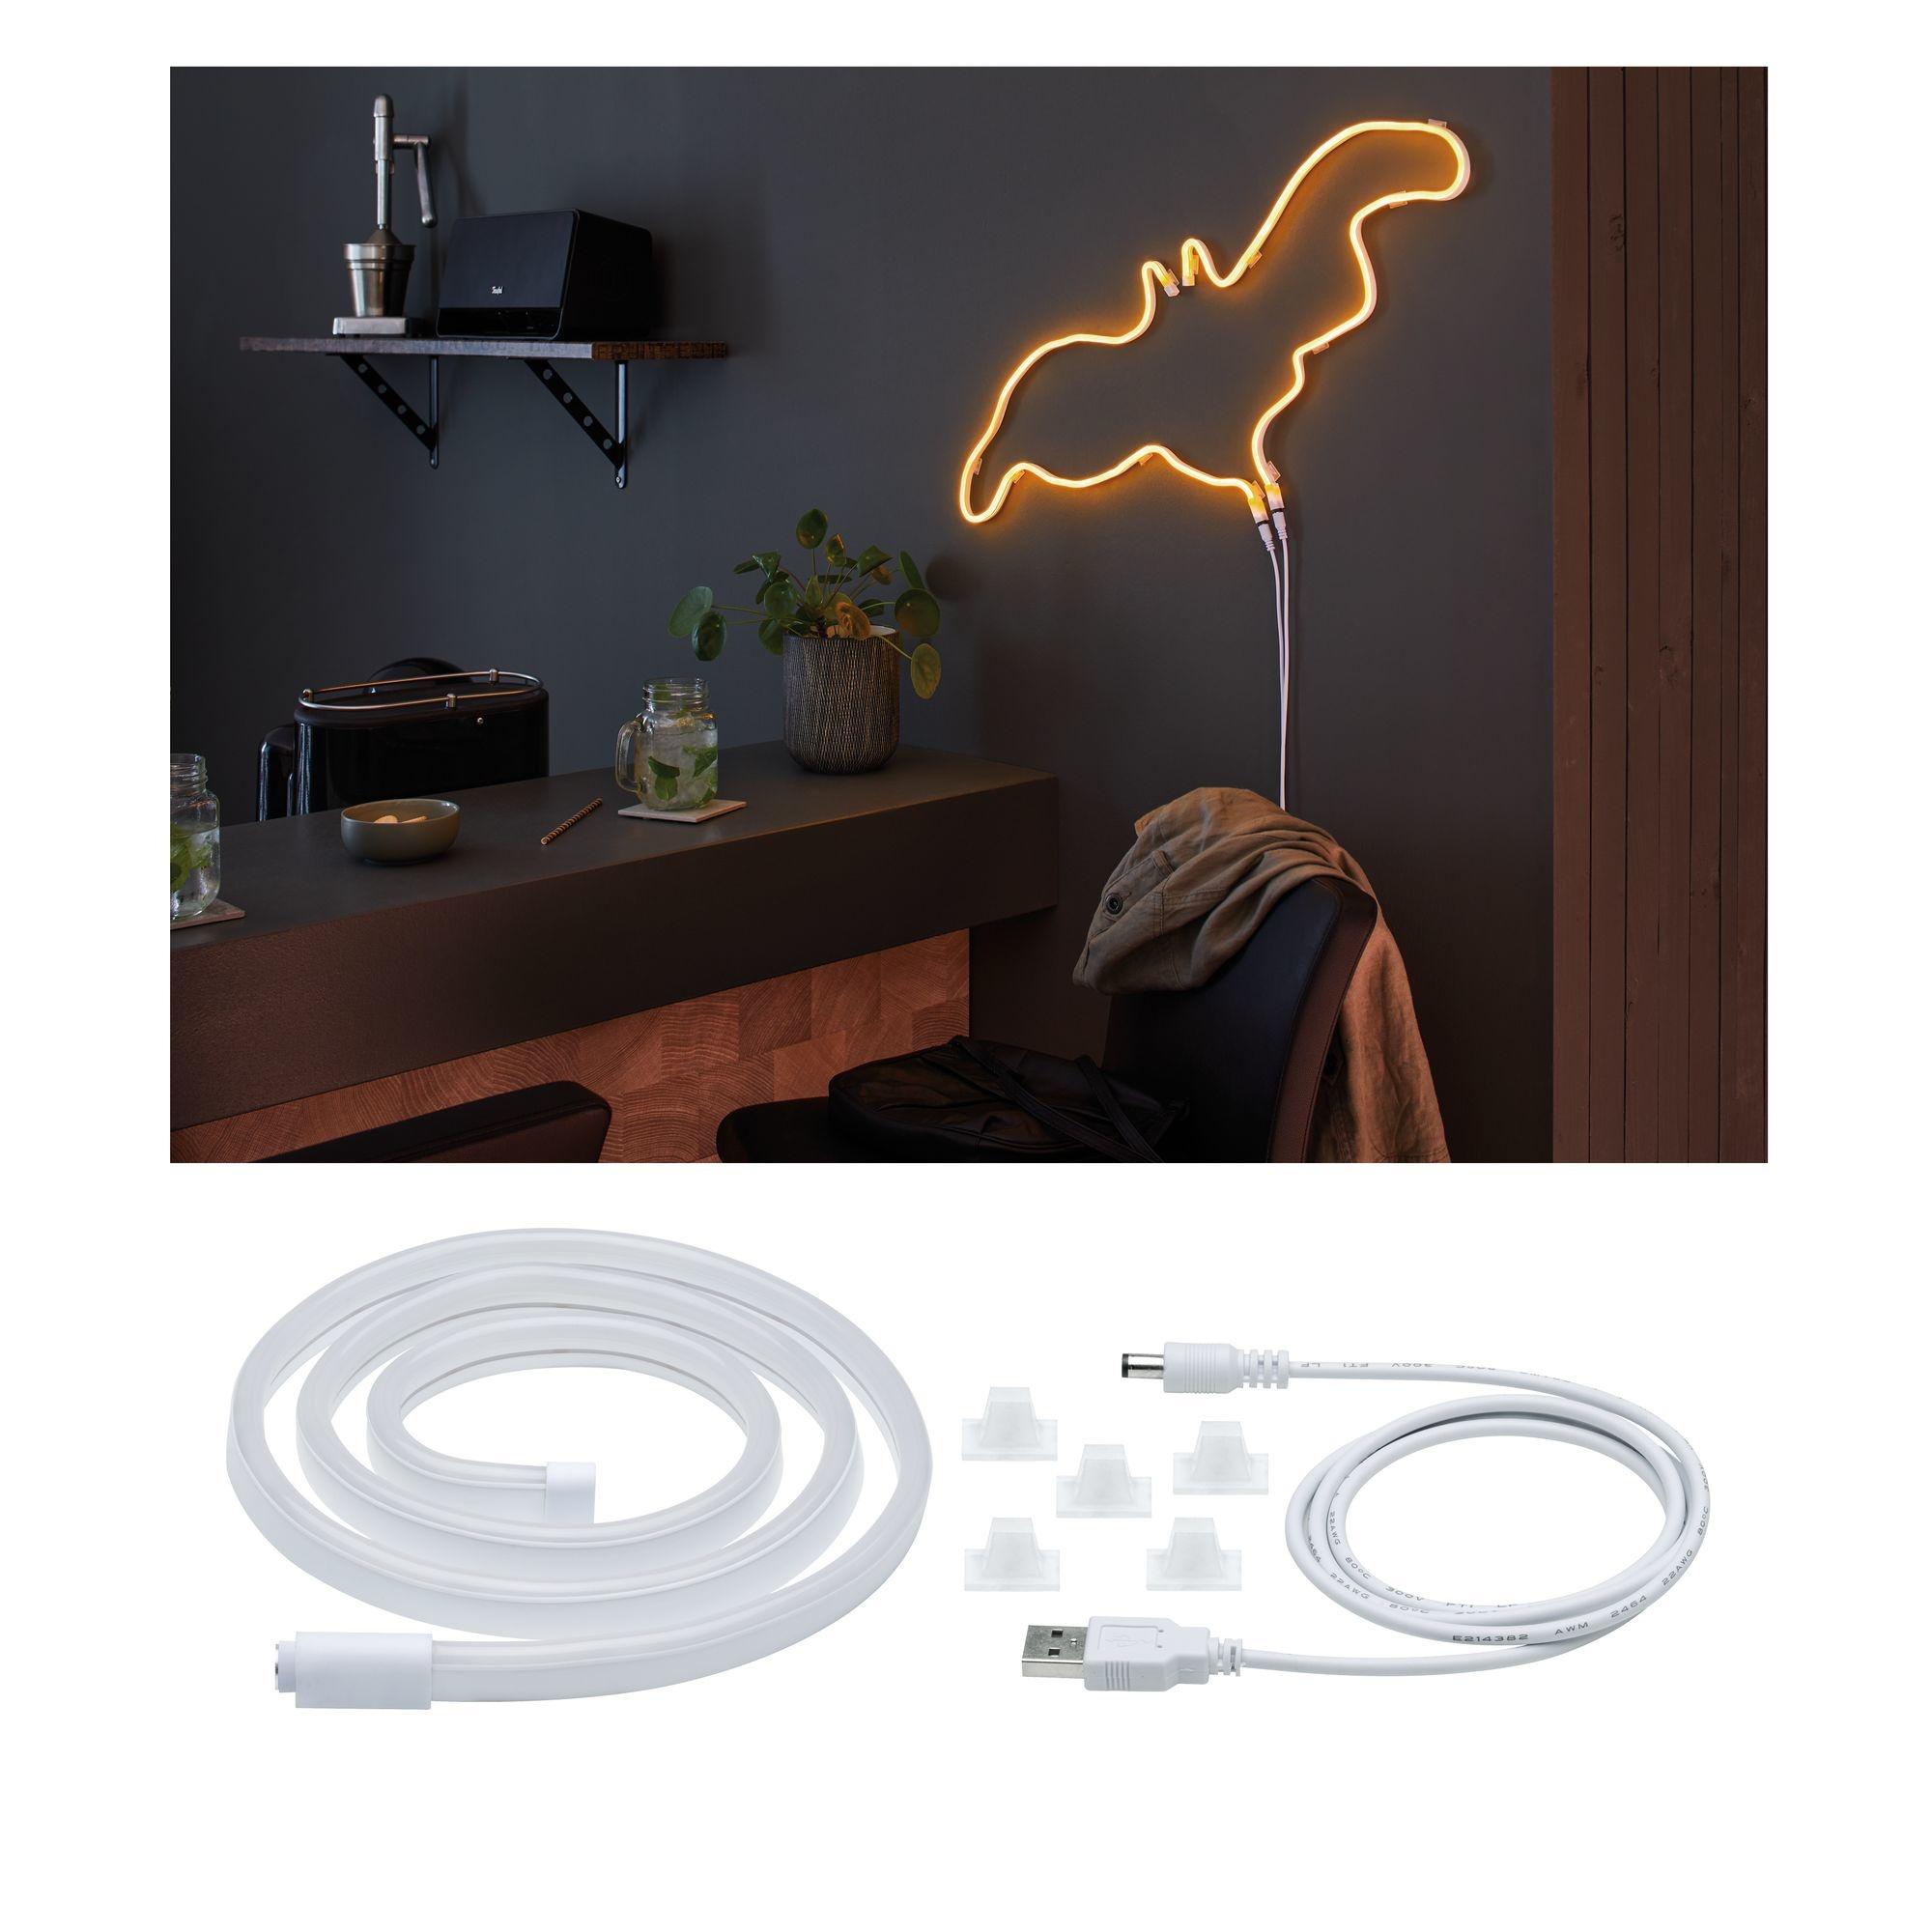 Paulmann Neon Colorflex USB Strip Orange 1m 4,5W 5V Orange/Weiß Kunststoff